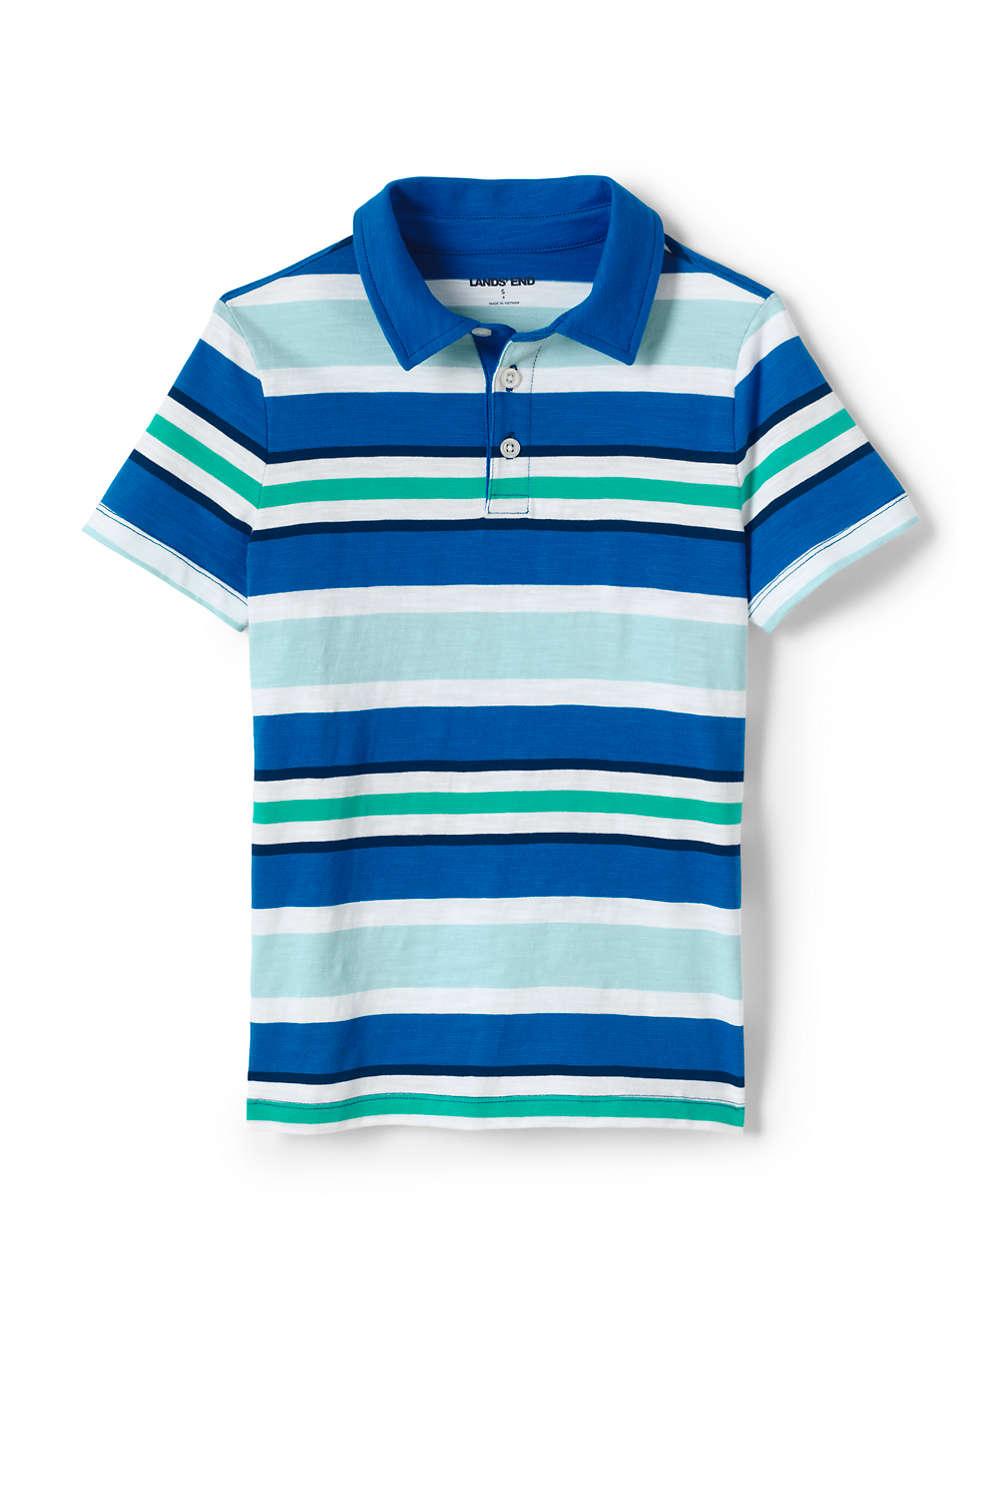 a660d42c663a70 Boys Stripe Slub Polo Shirt from Lands' End